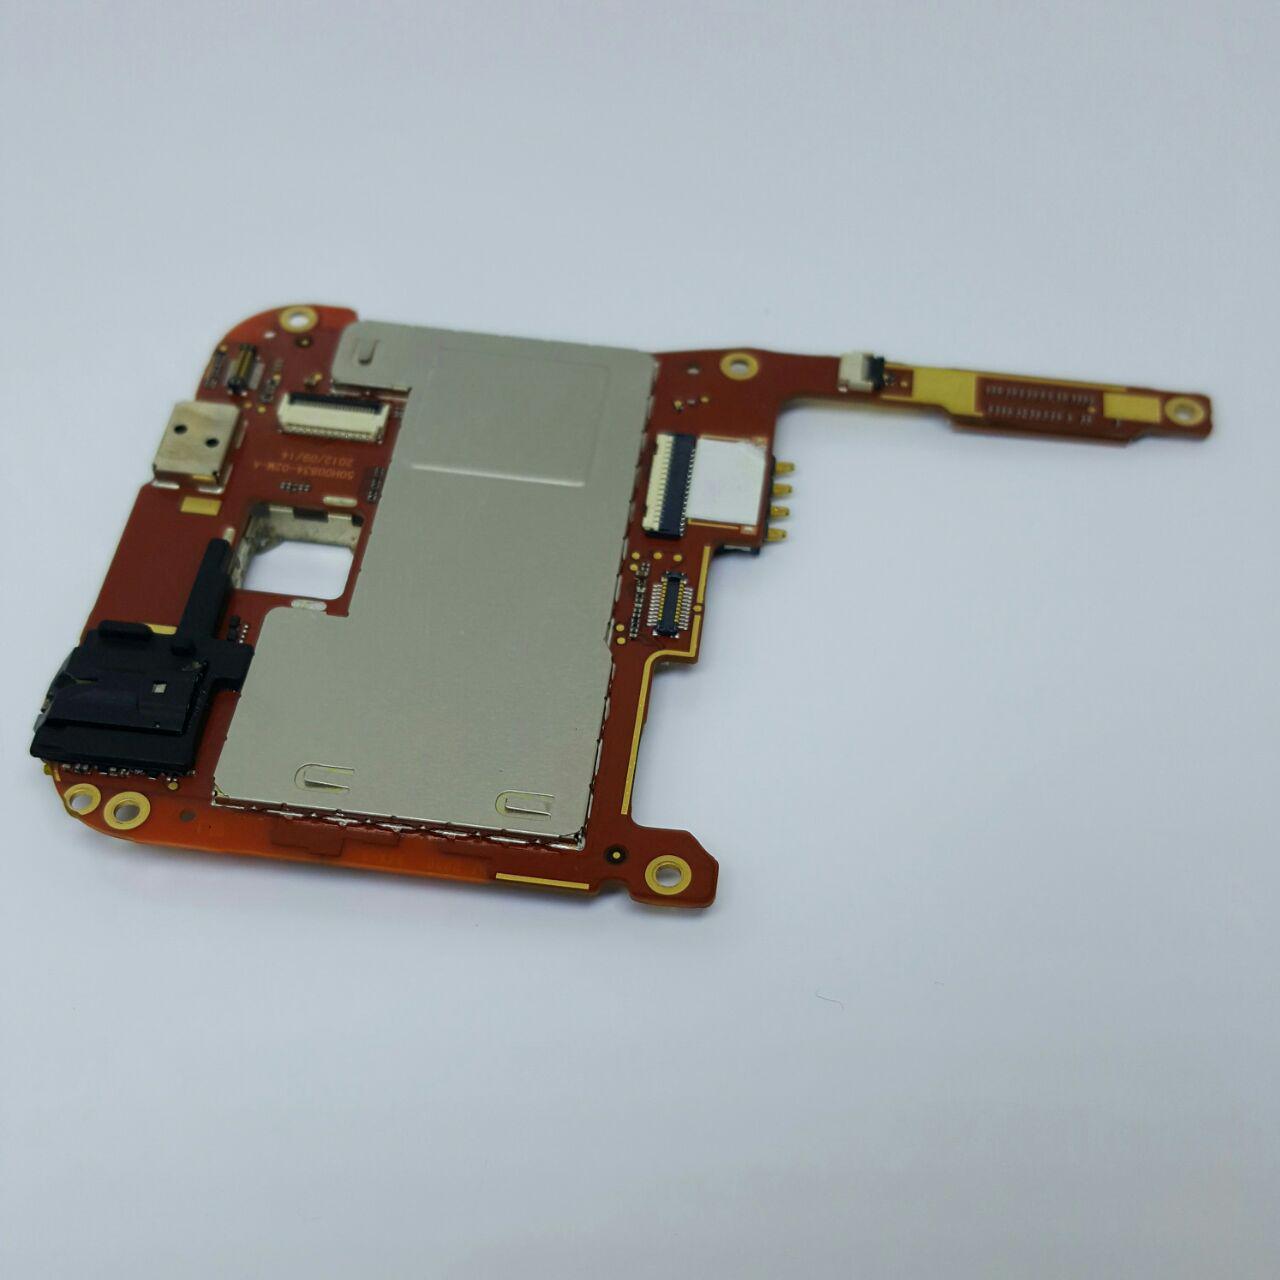 HTC Desire SV T326e PM86100 MAGNIDS Logic Board Mainboard Motherboard